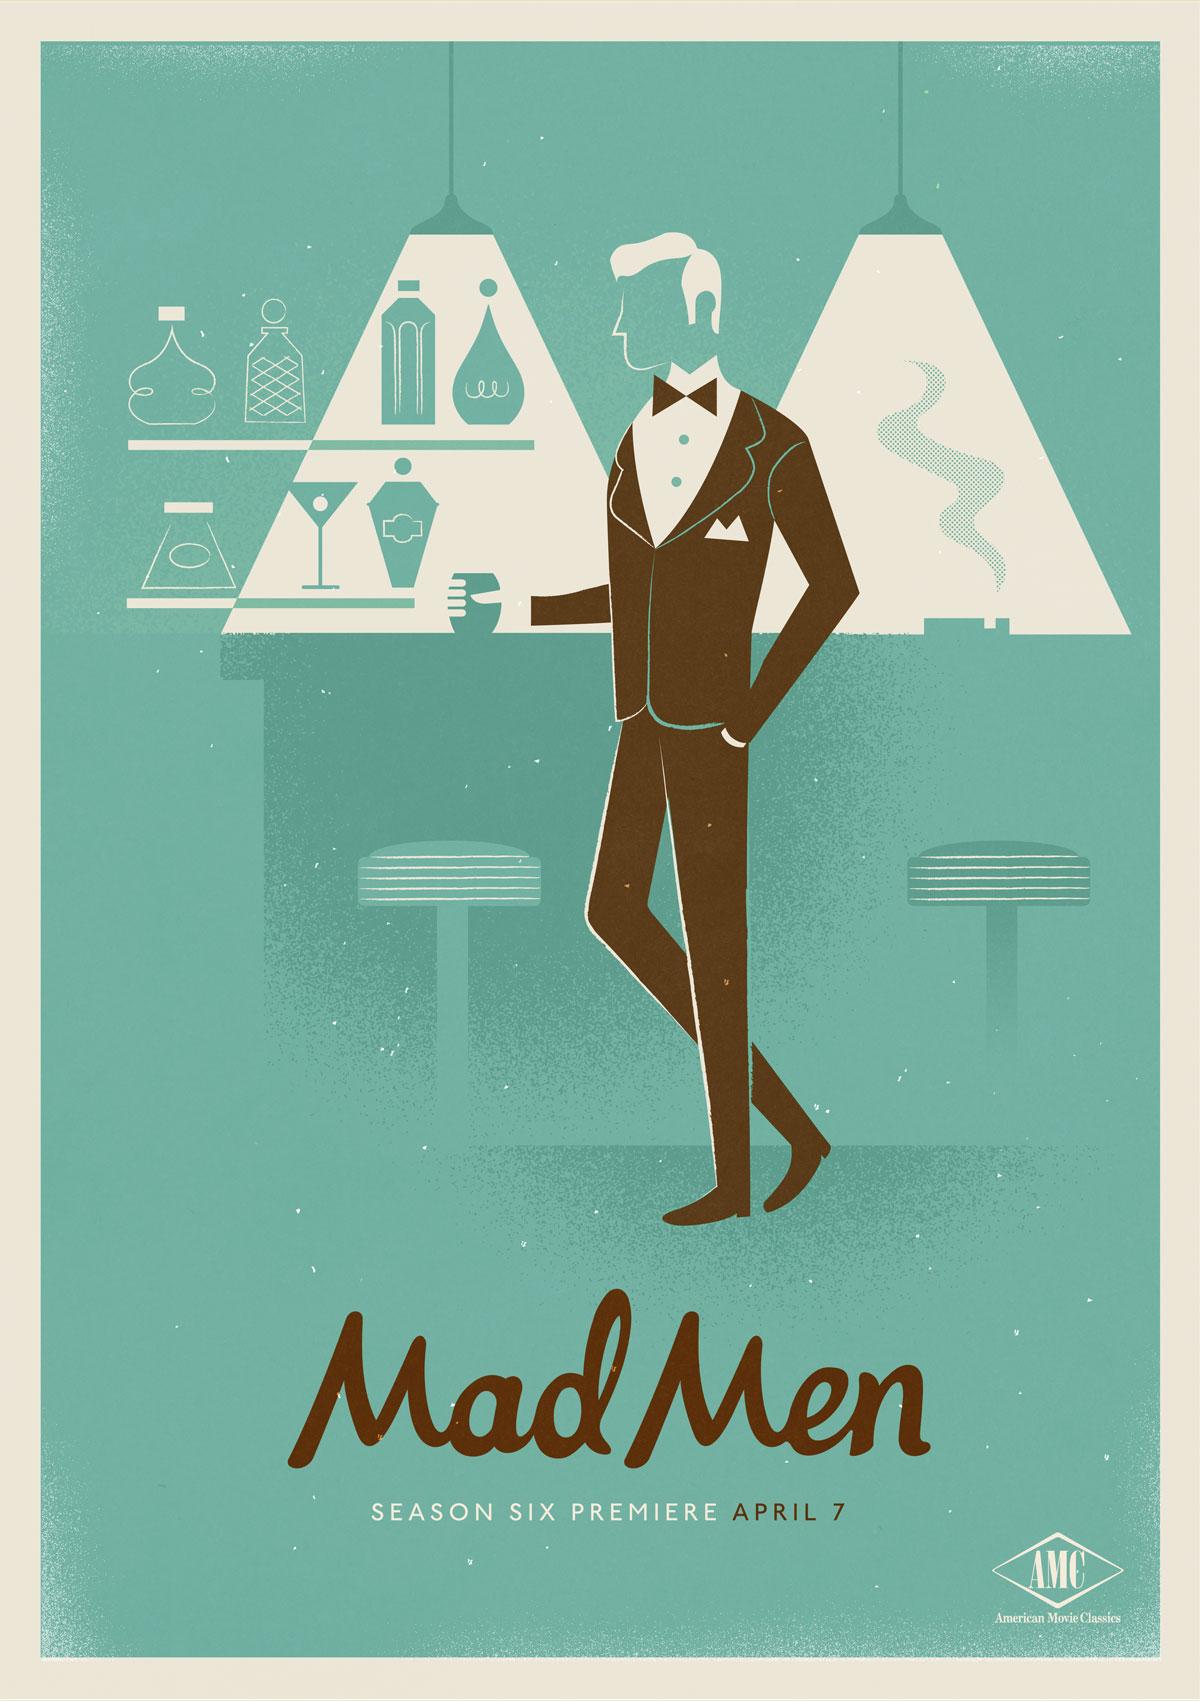 mad men season 6 poster designs by radio